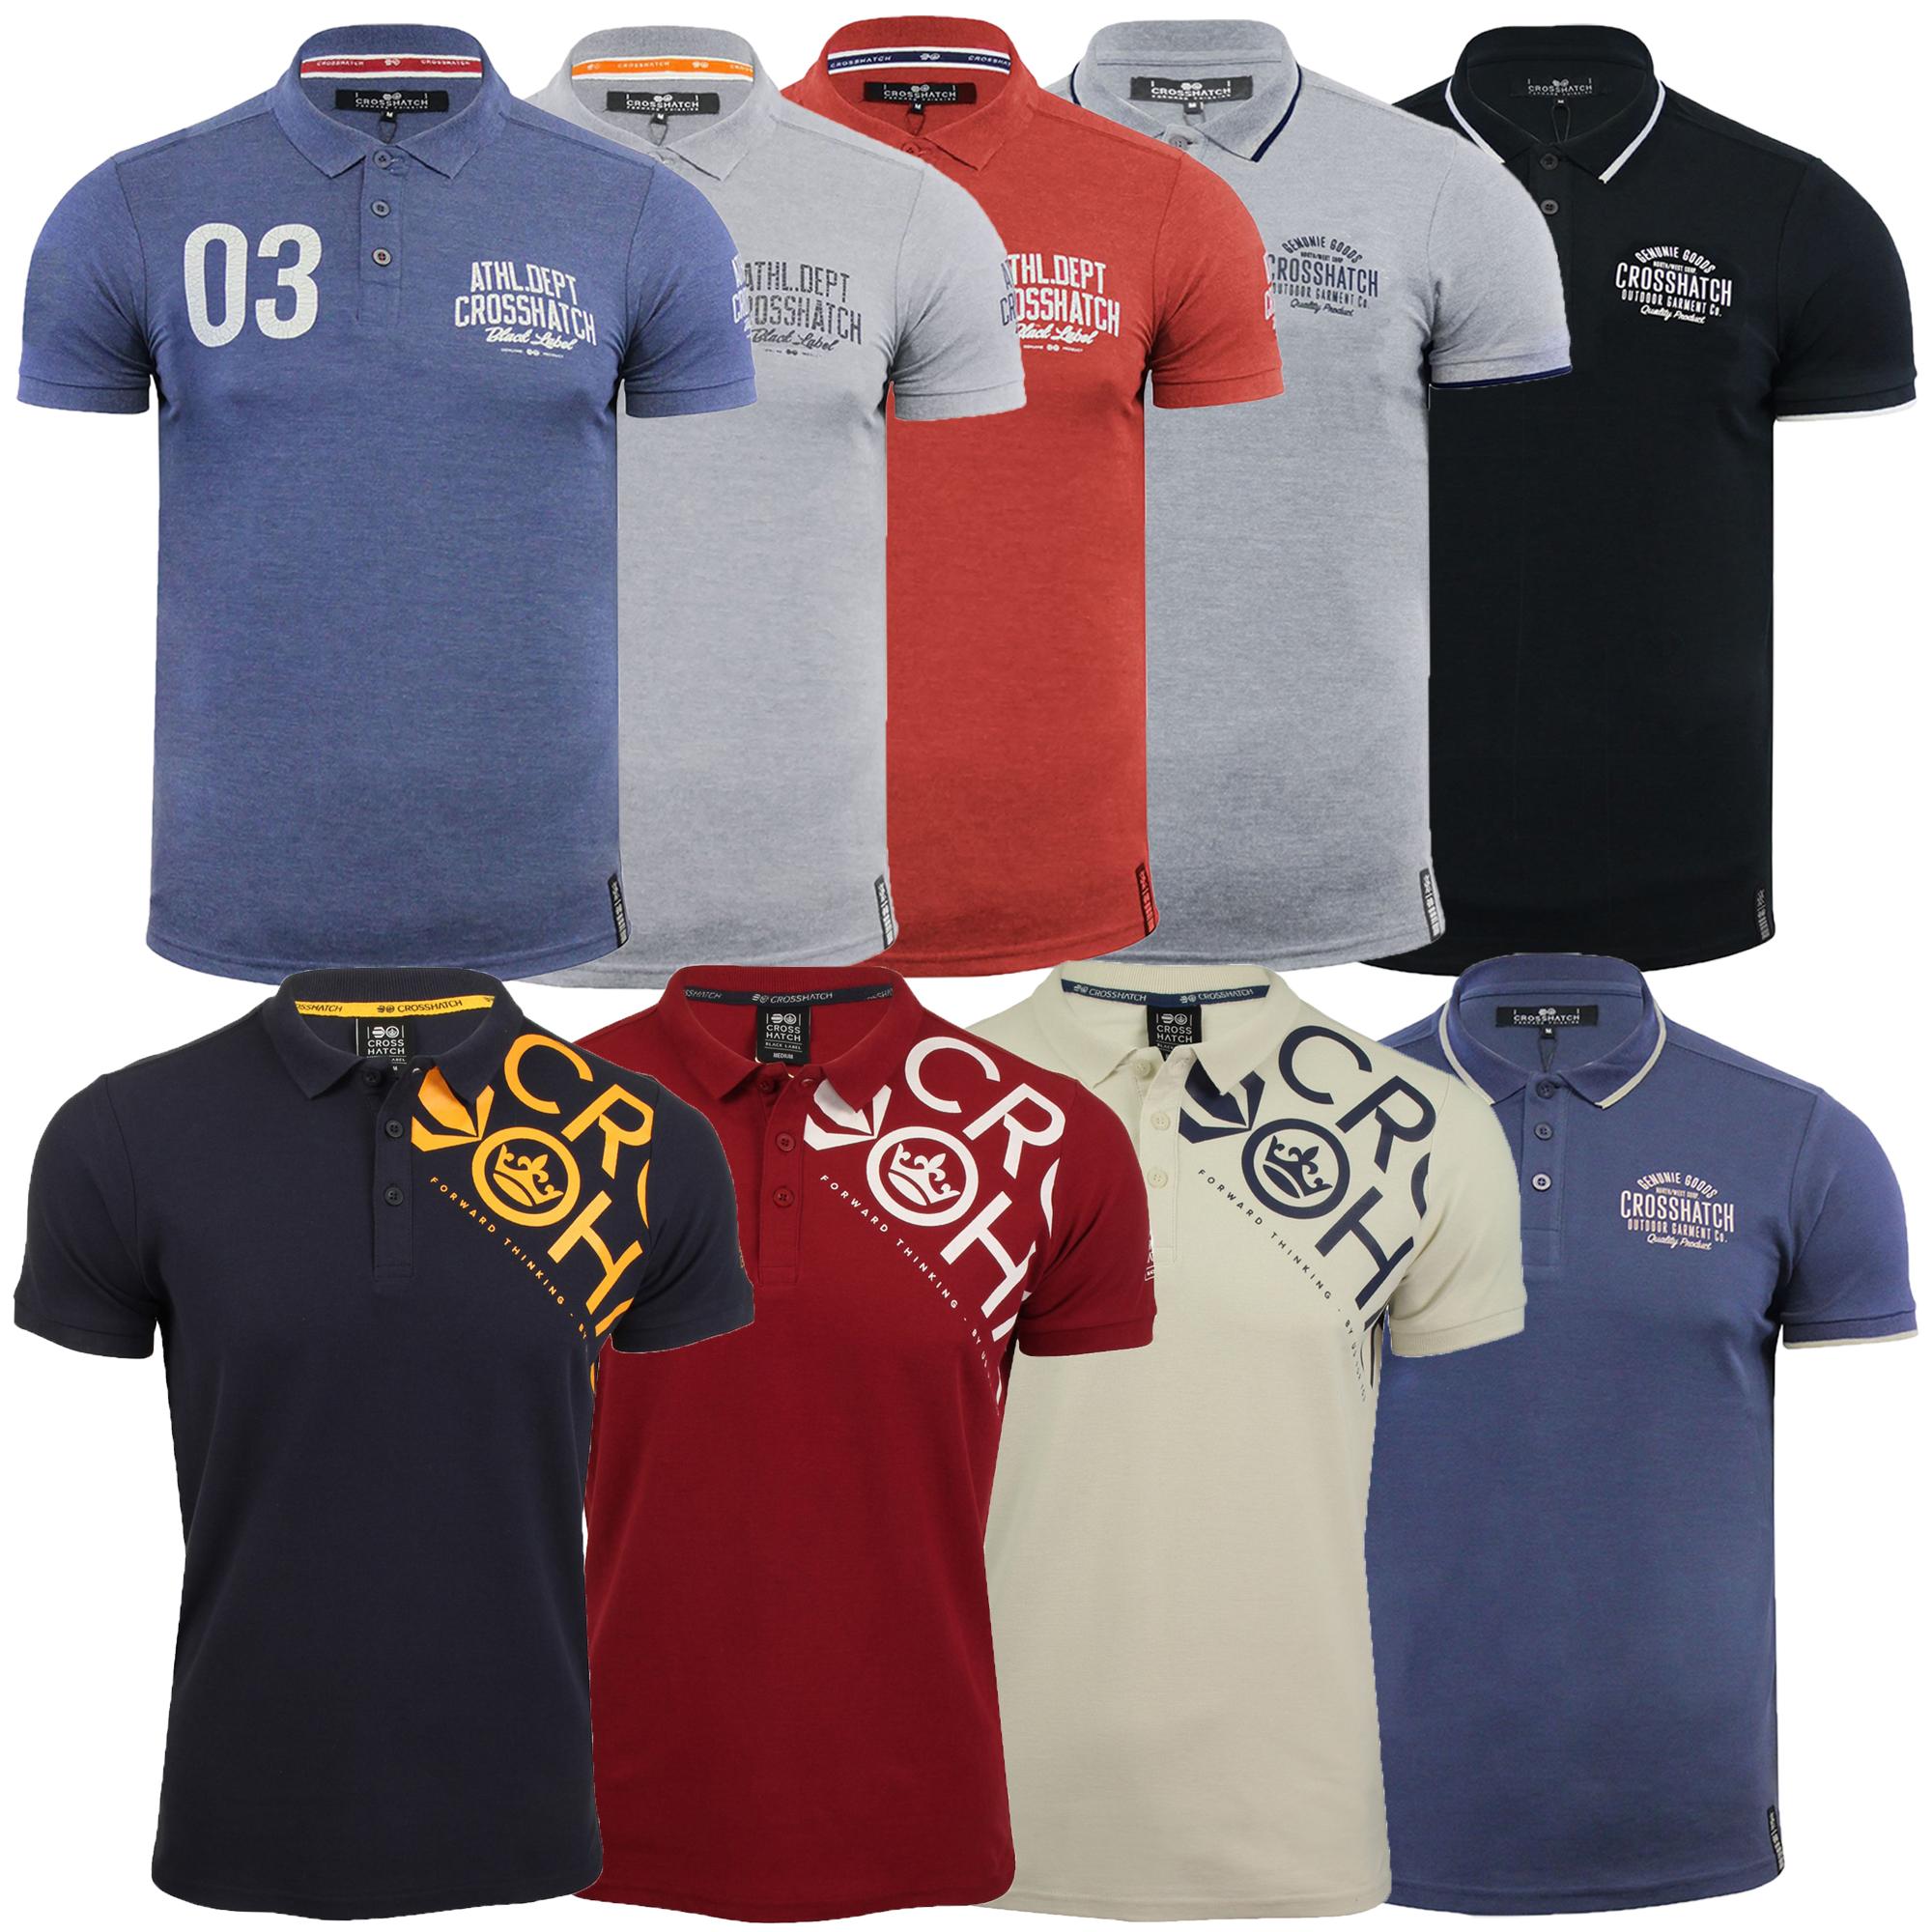 Crosshatch Mens Polo Shirt Ribbed Collar Cotton T Shirt Short Sleeve Casual Top